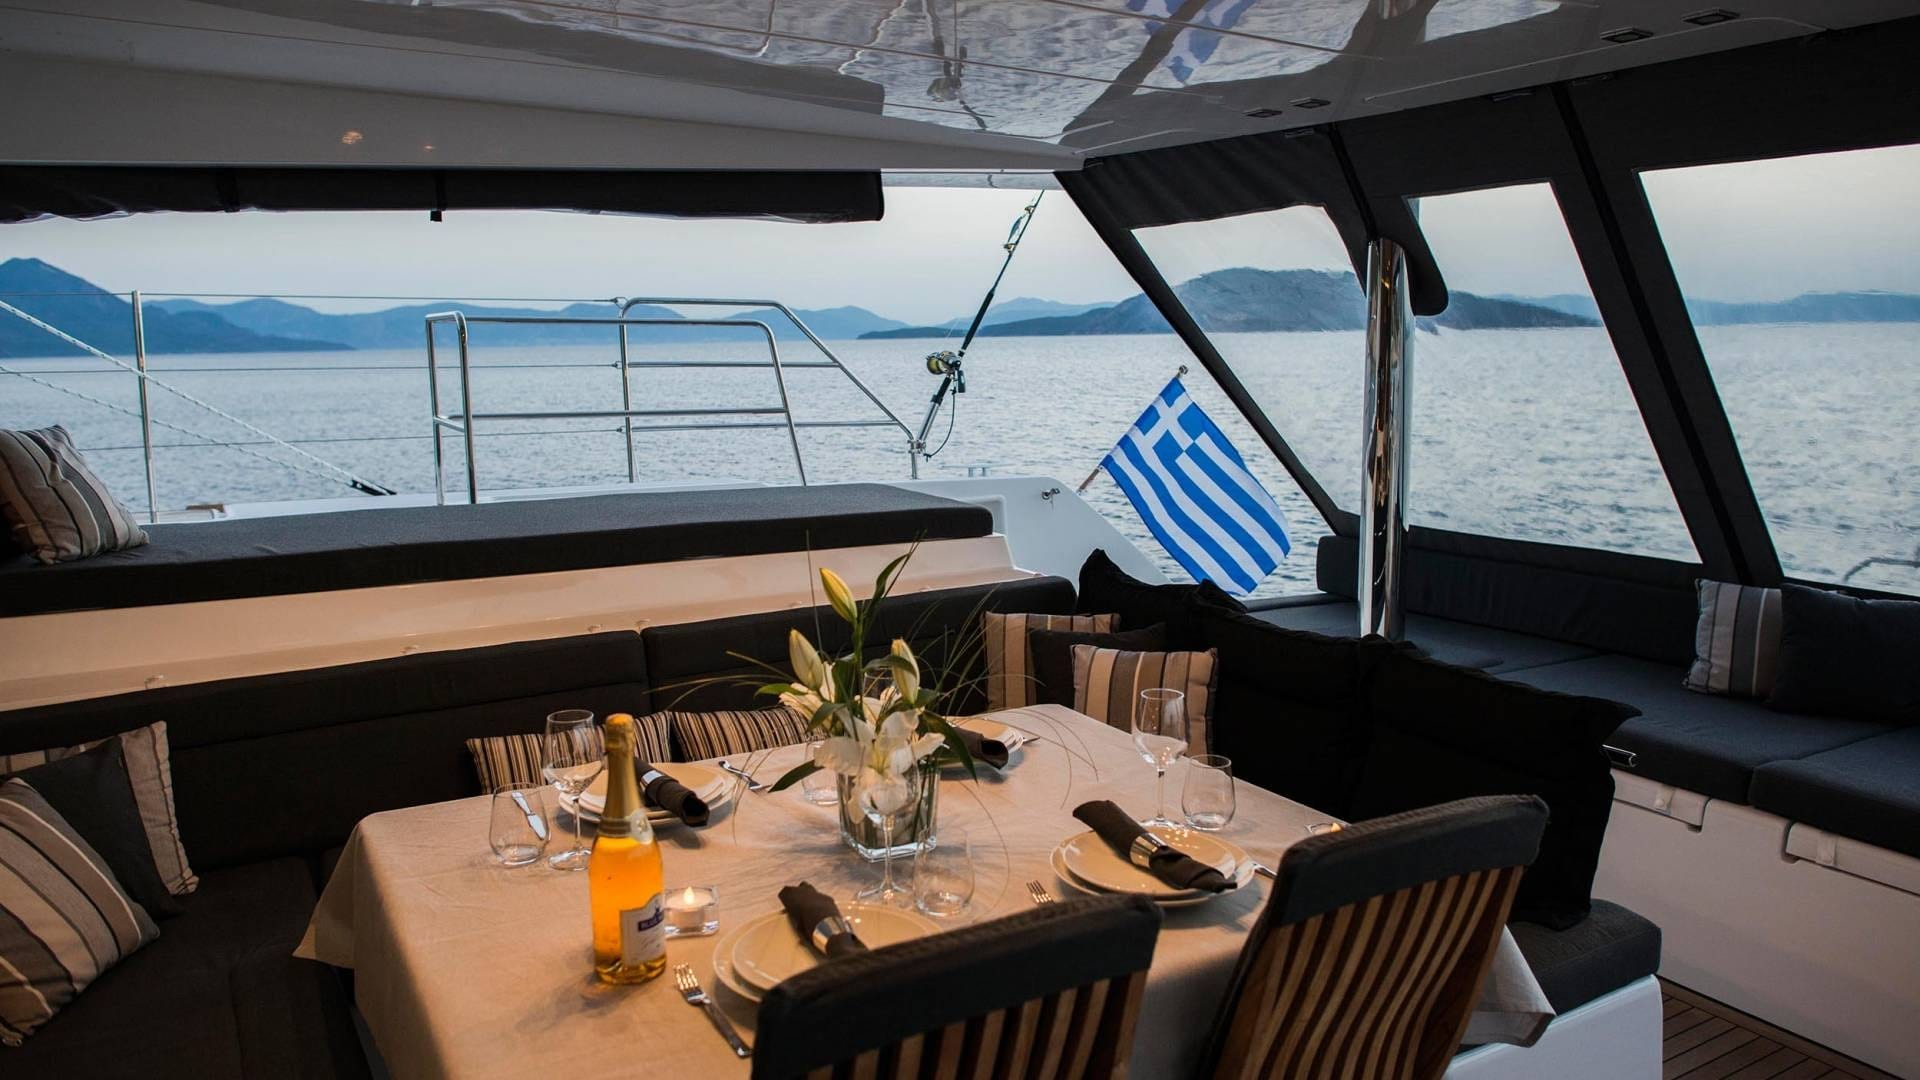 alyssa catamaran lagoon dining aboard (2) -  Valef Yachts Chartering - 2370